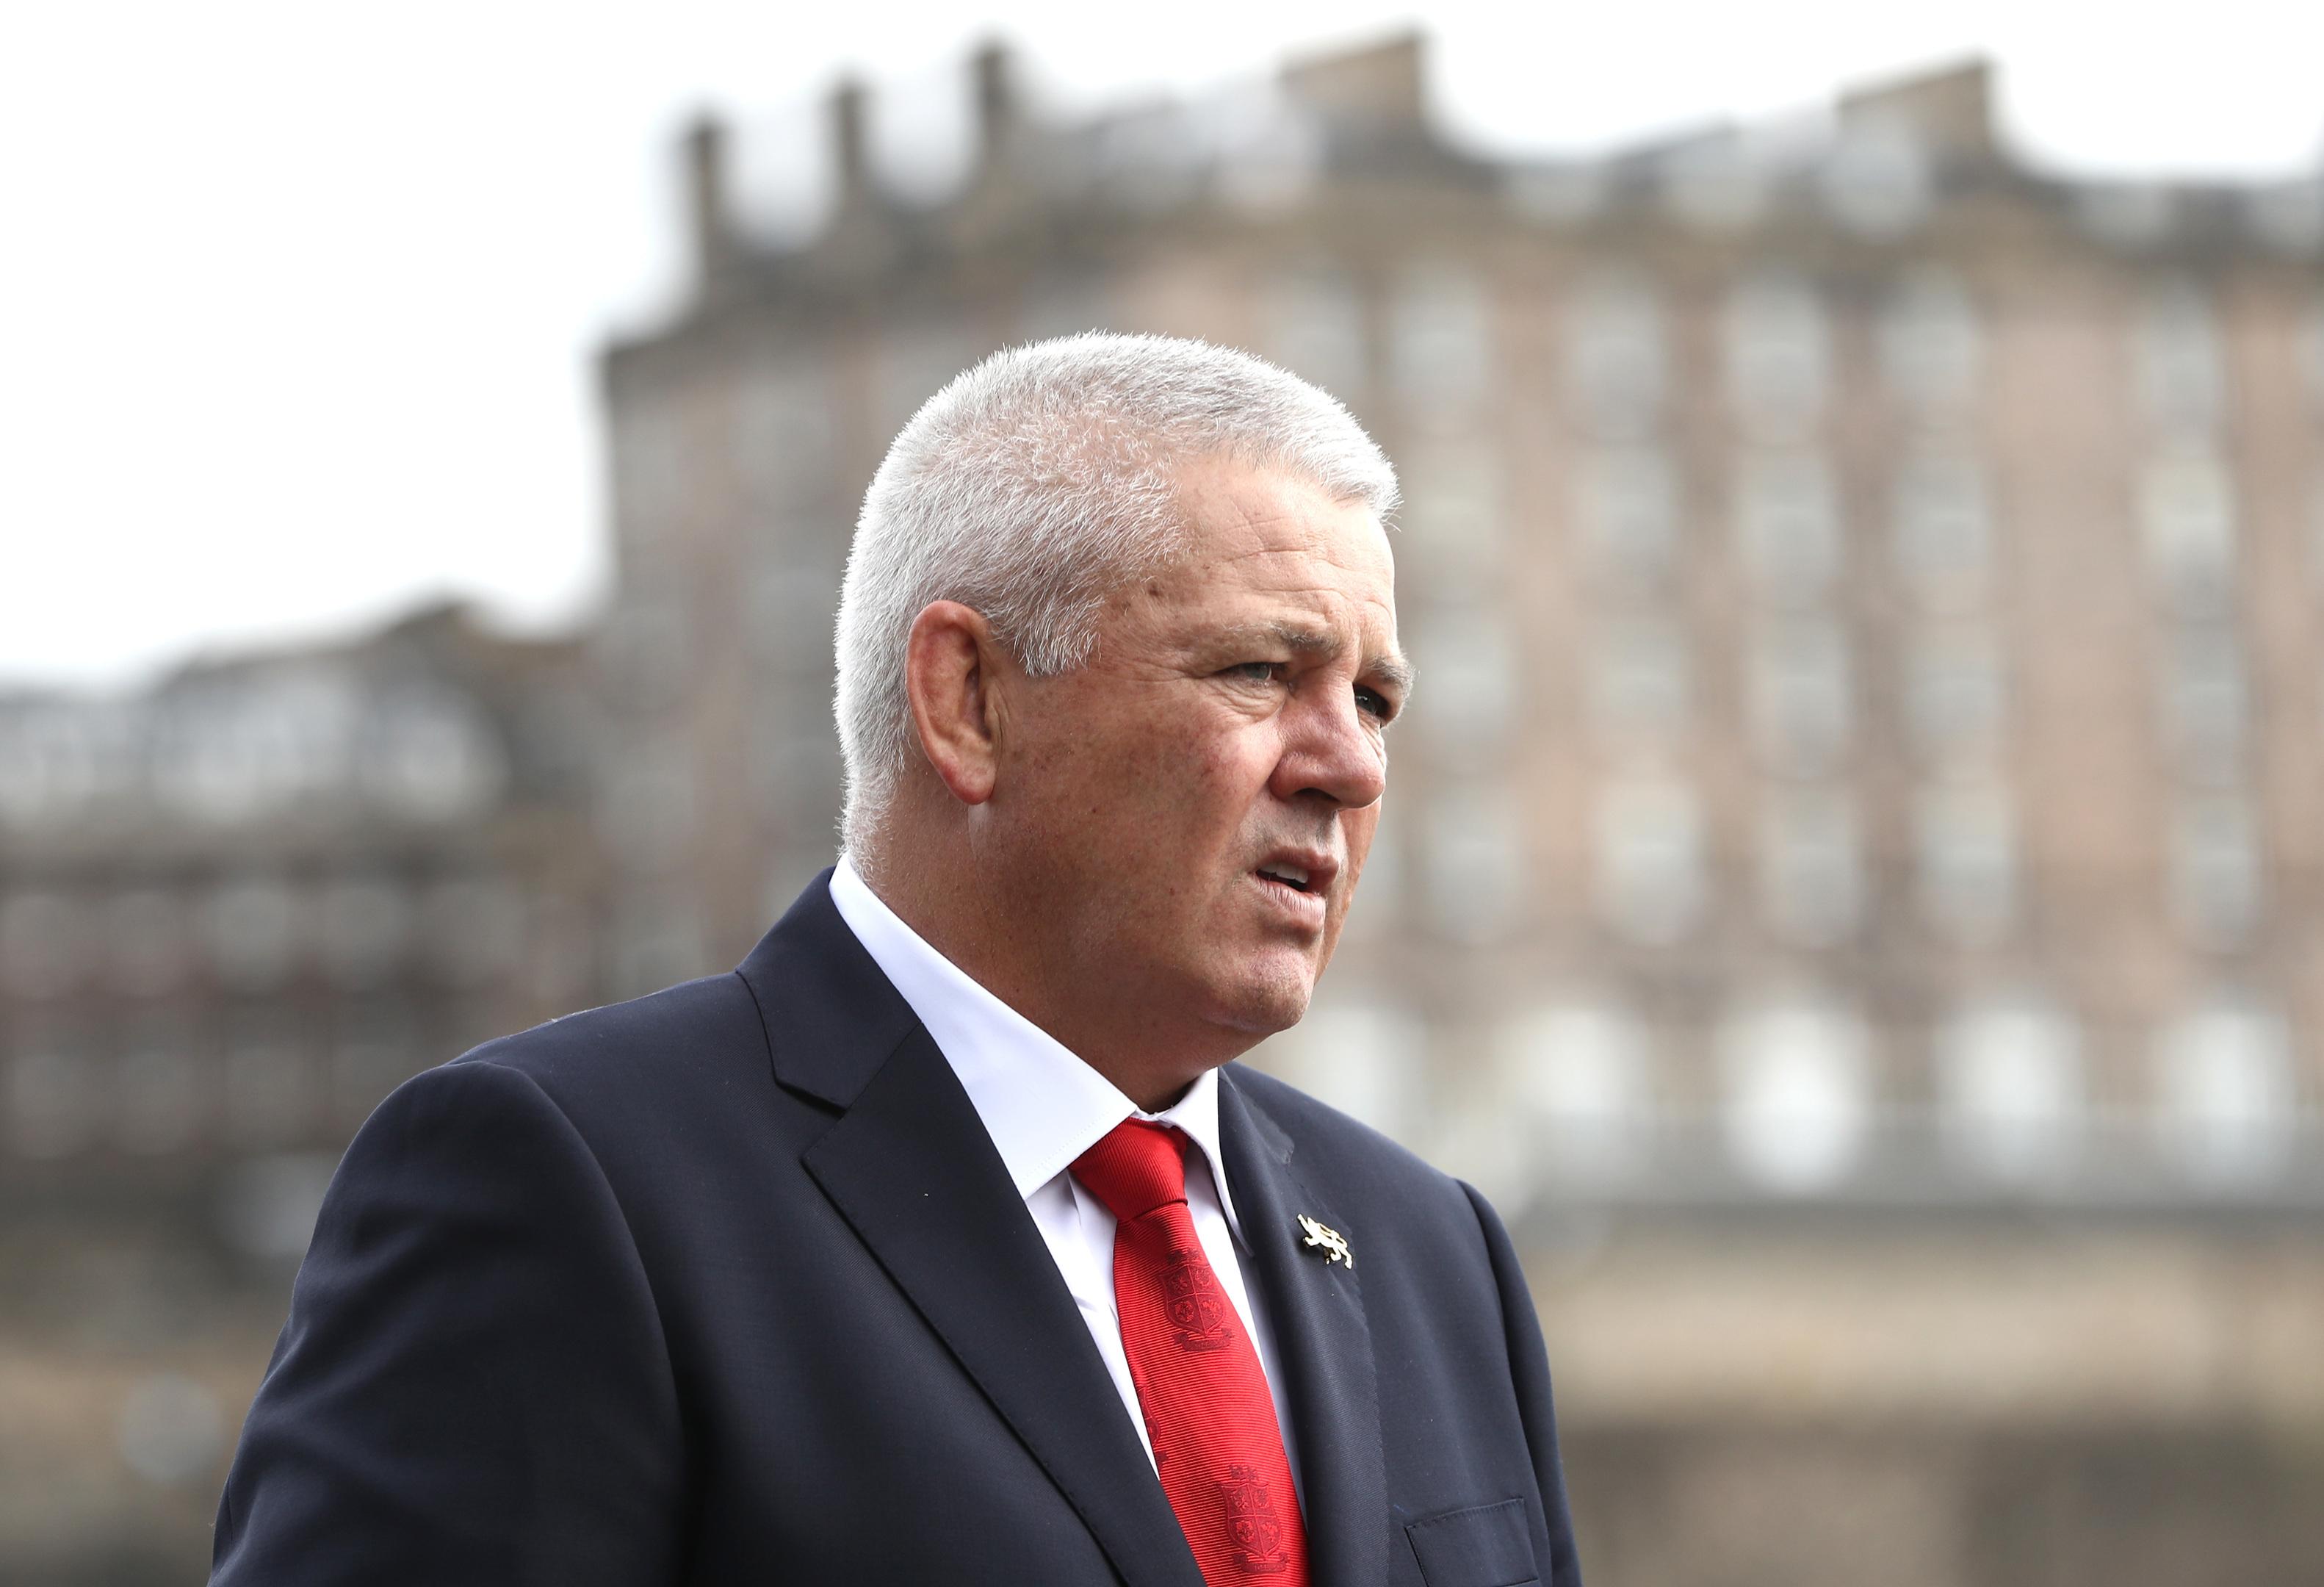 A pensive Warren Gatland at the Lions head coach announcement in Edinburgh.